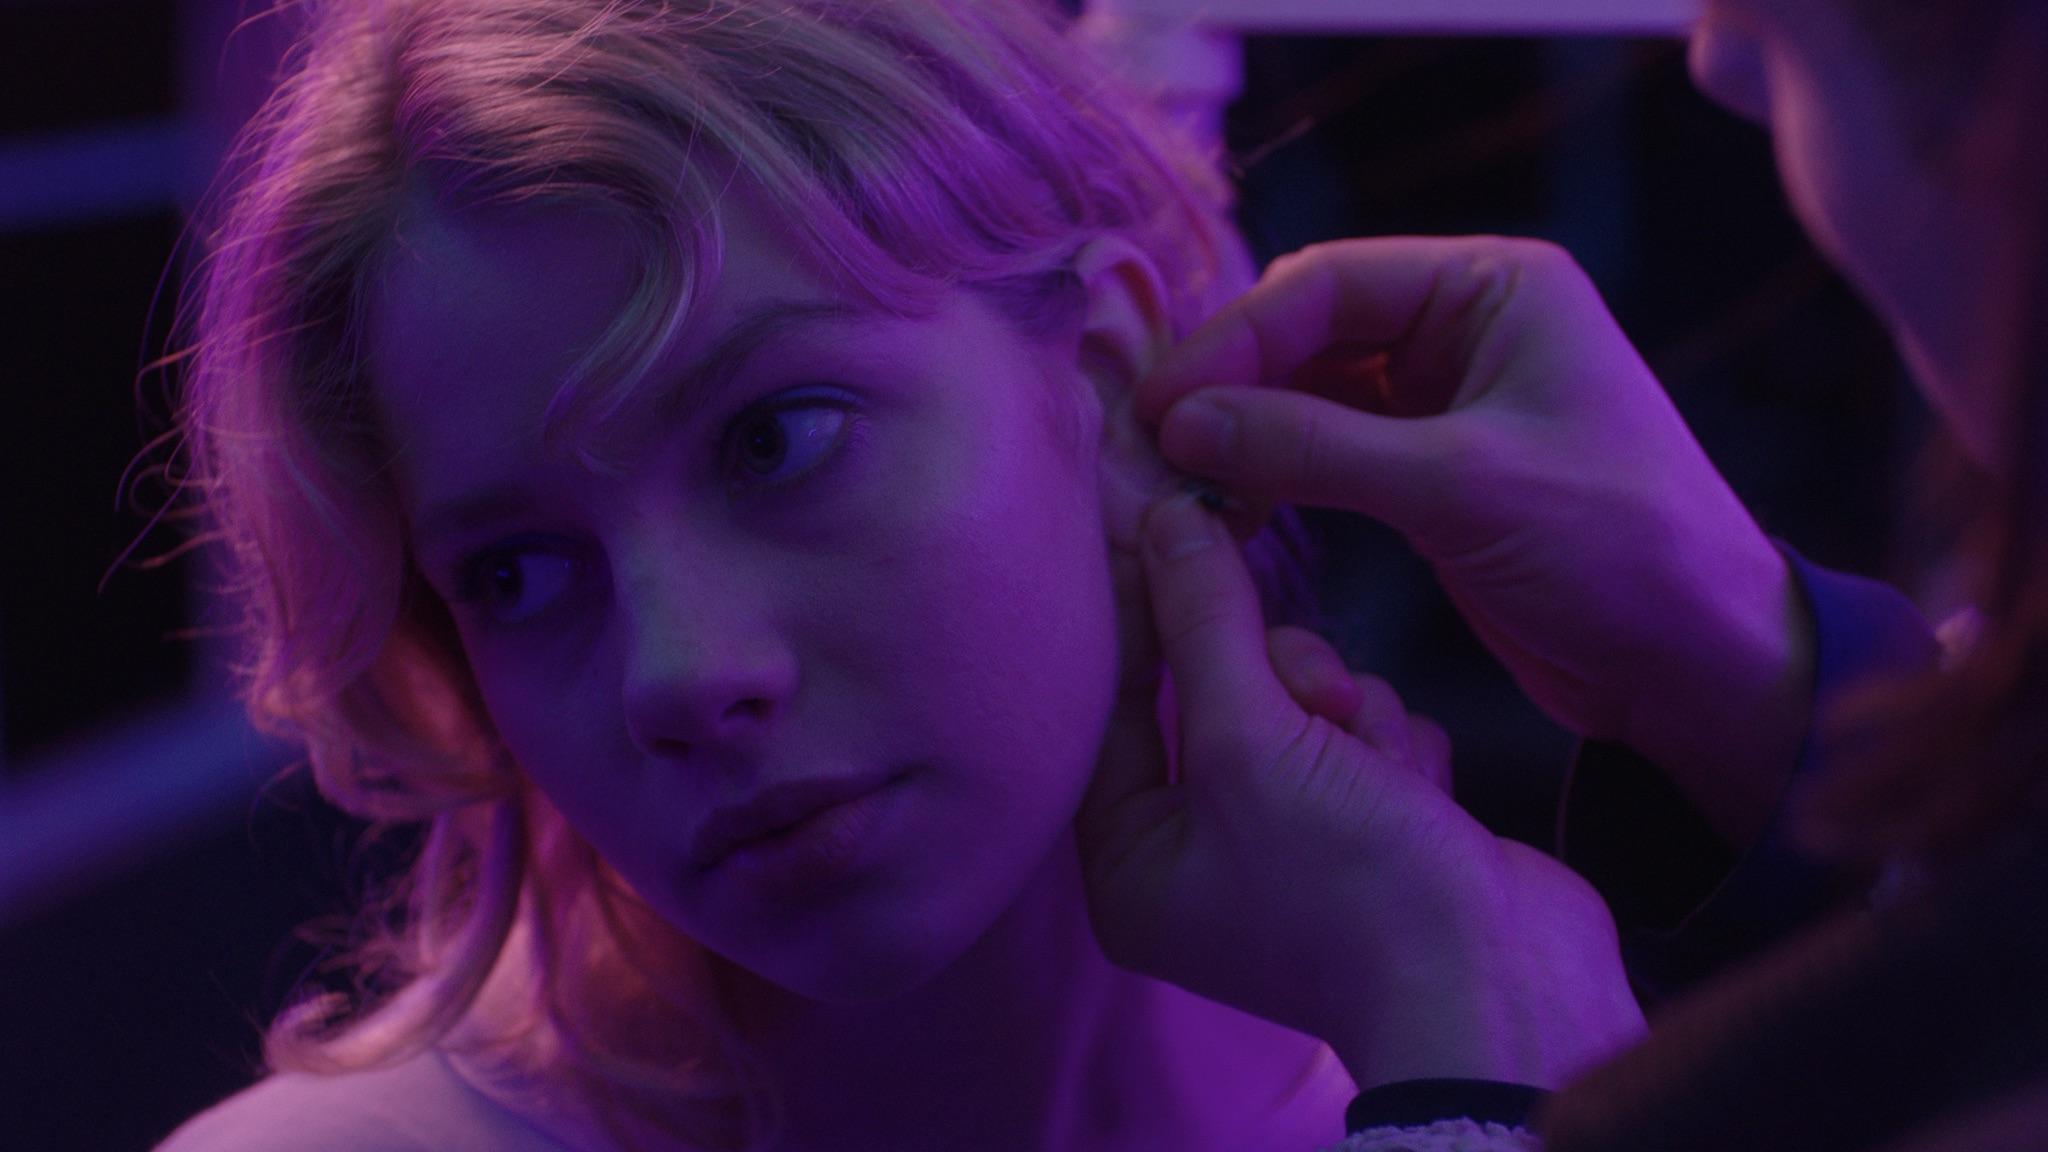 Charlie presses an earrings into Poppy's ear